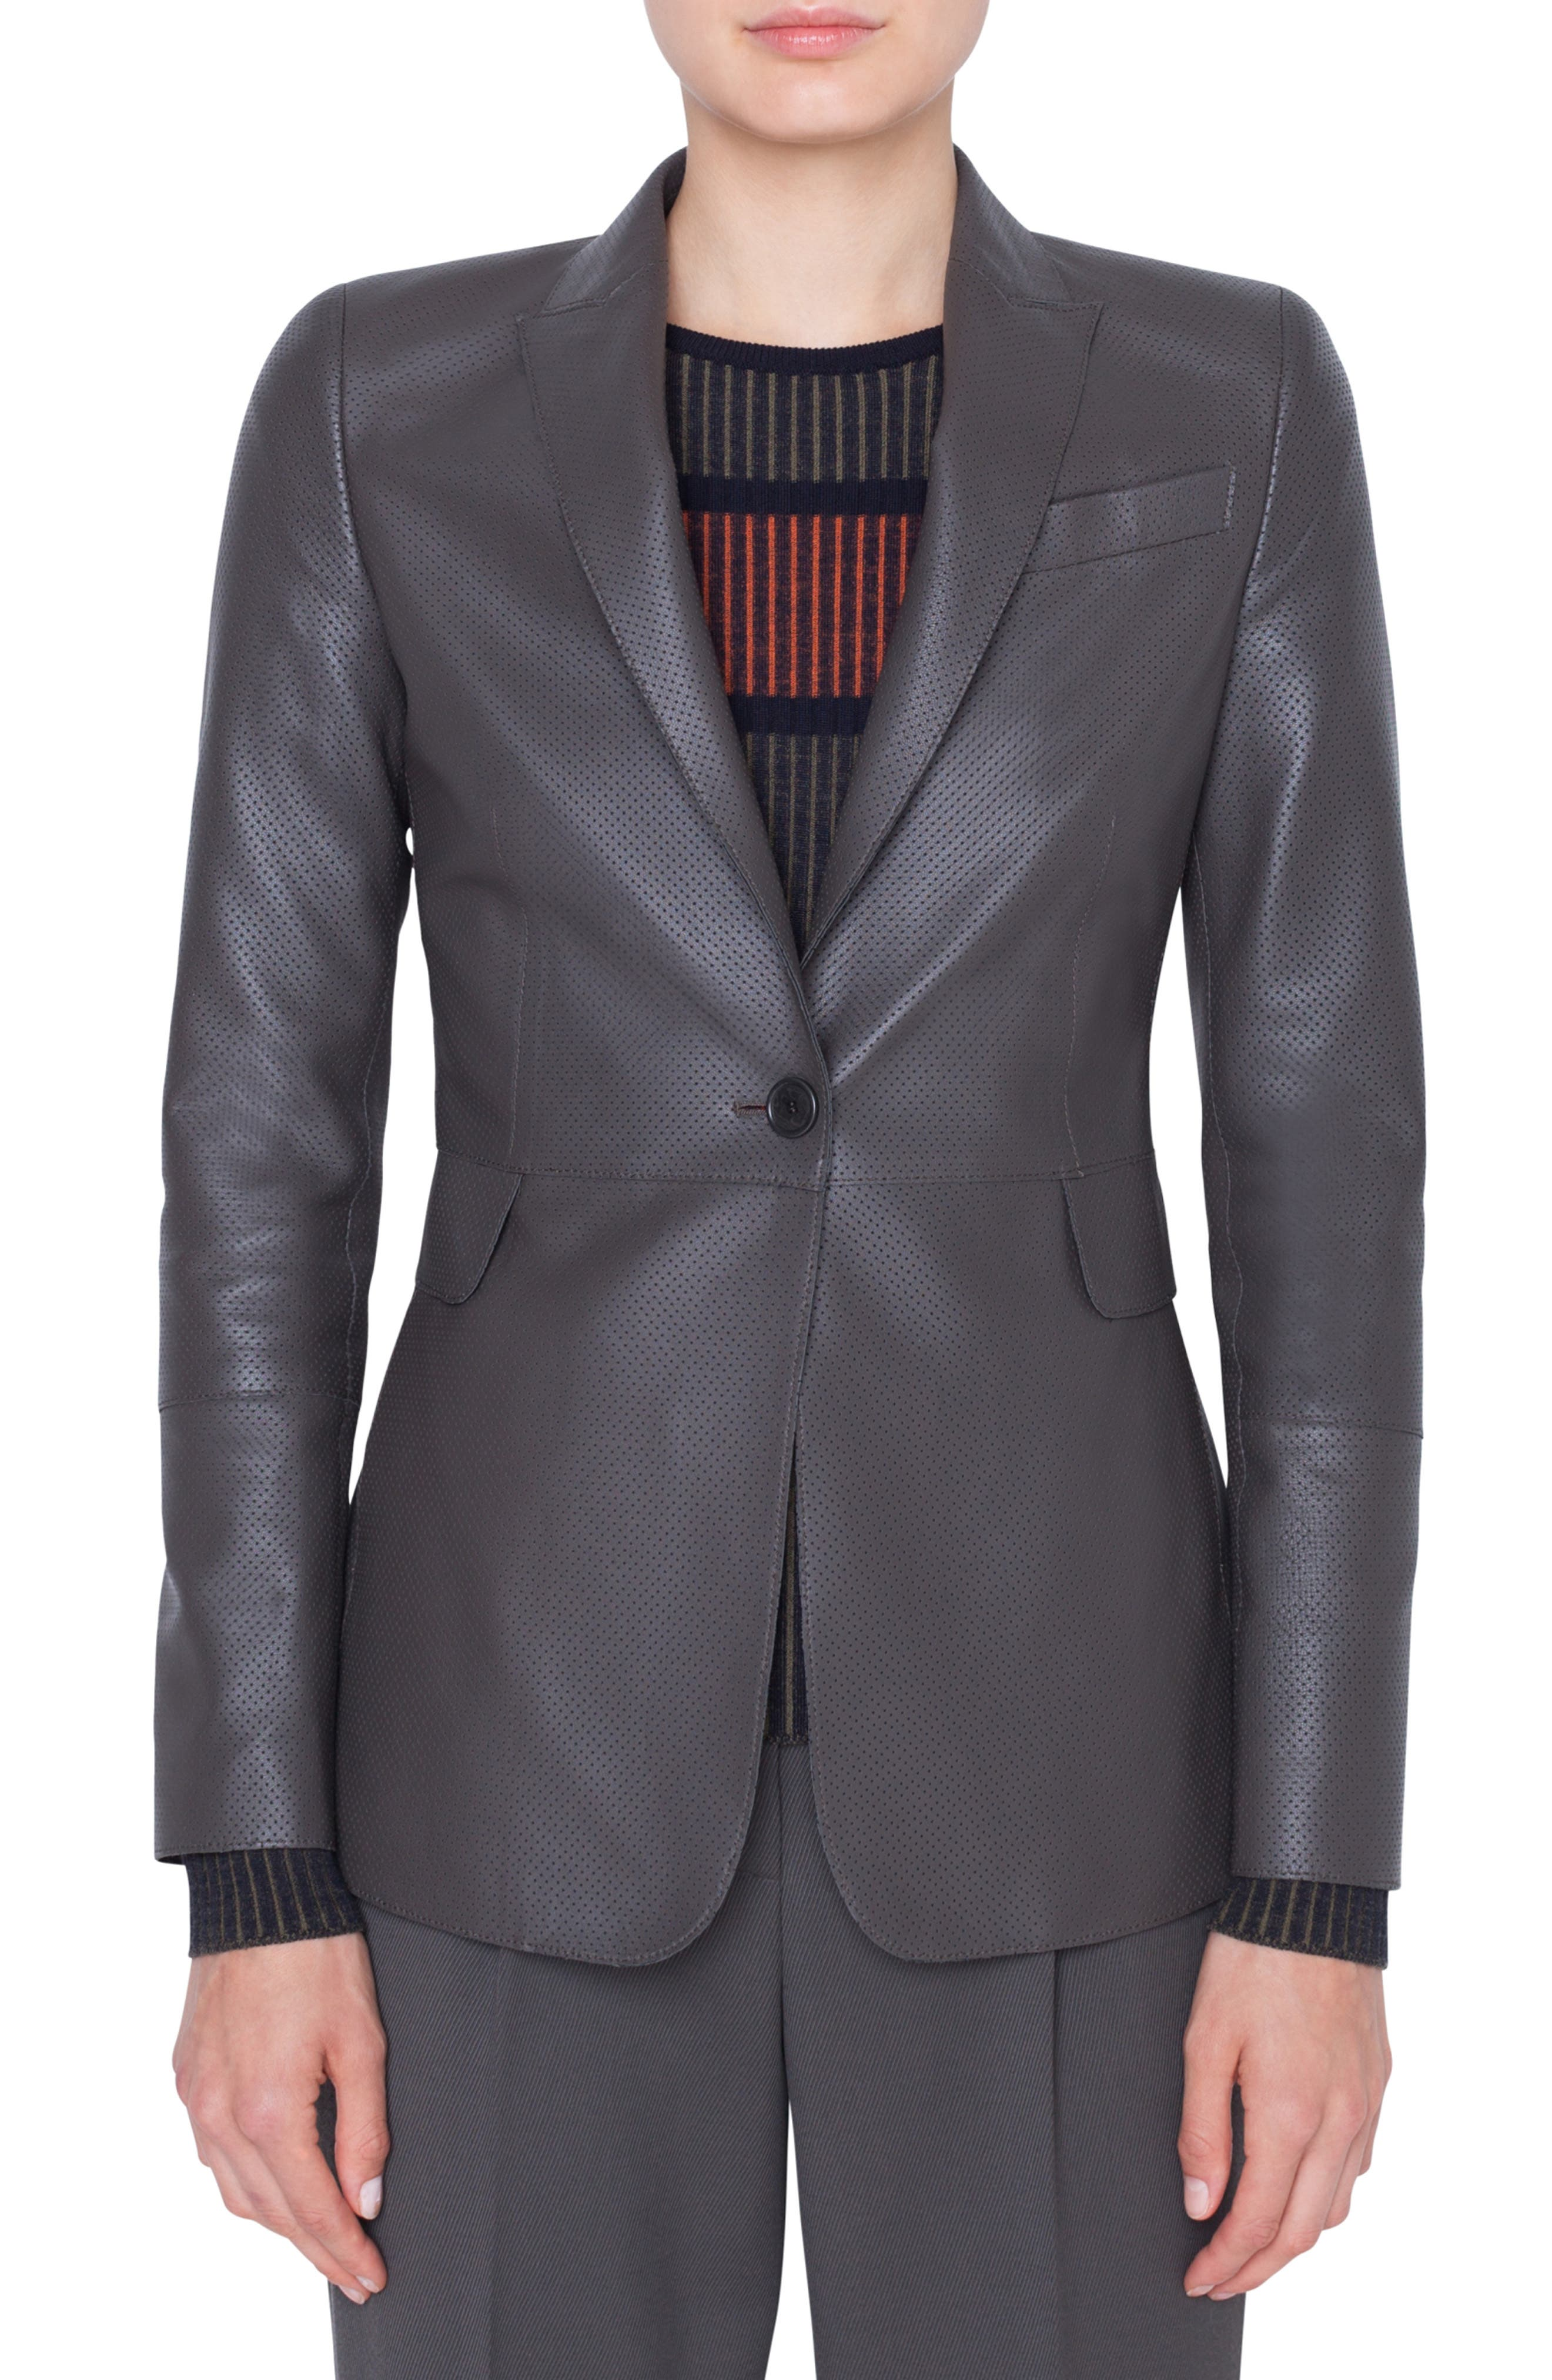 AKRIS PUNTO Perforated Leather Blazer, Main, color, OLIVA